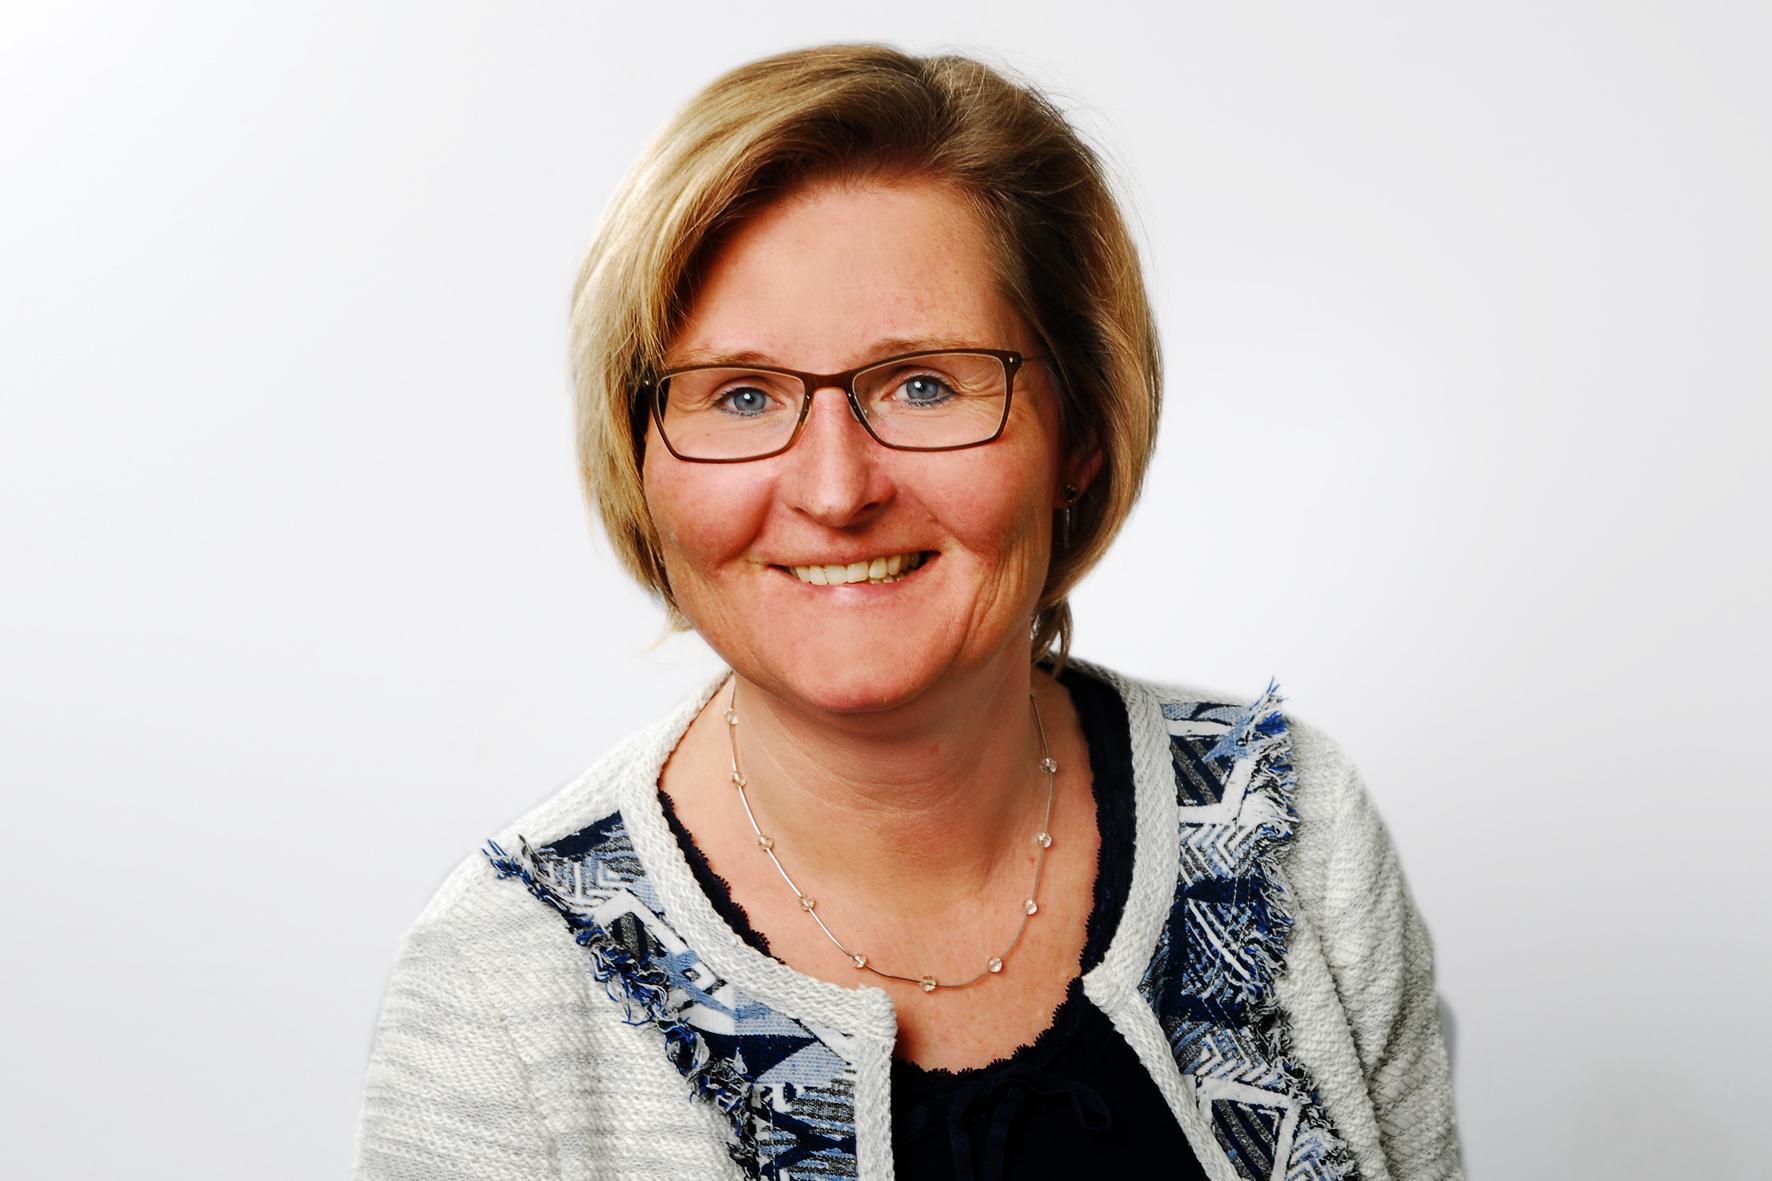 Birgit Bergk